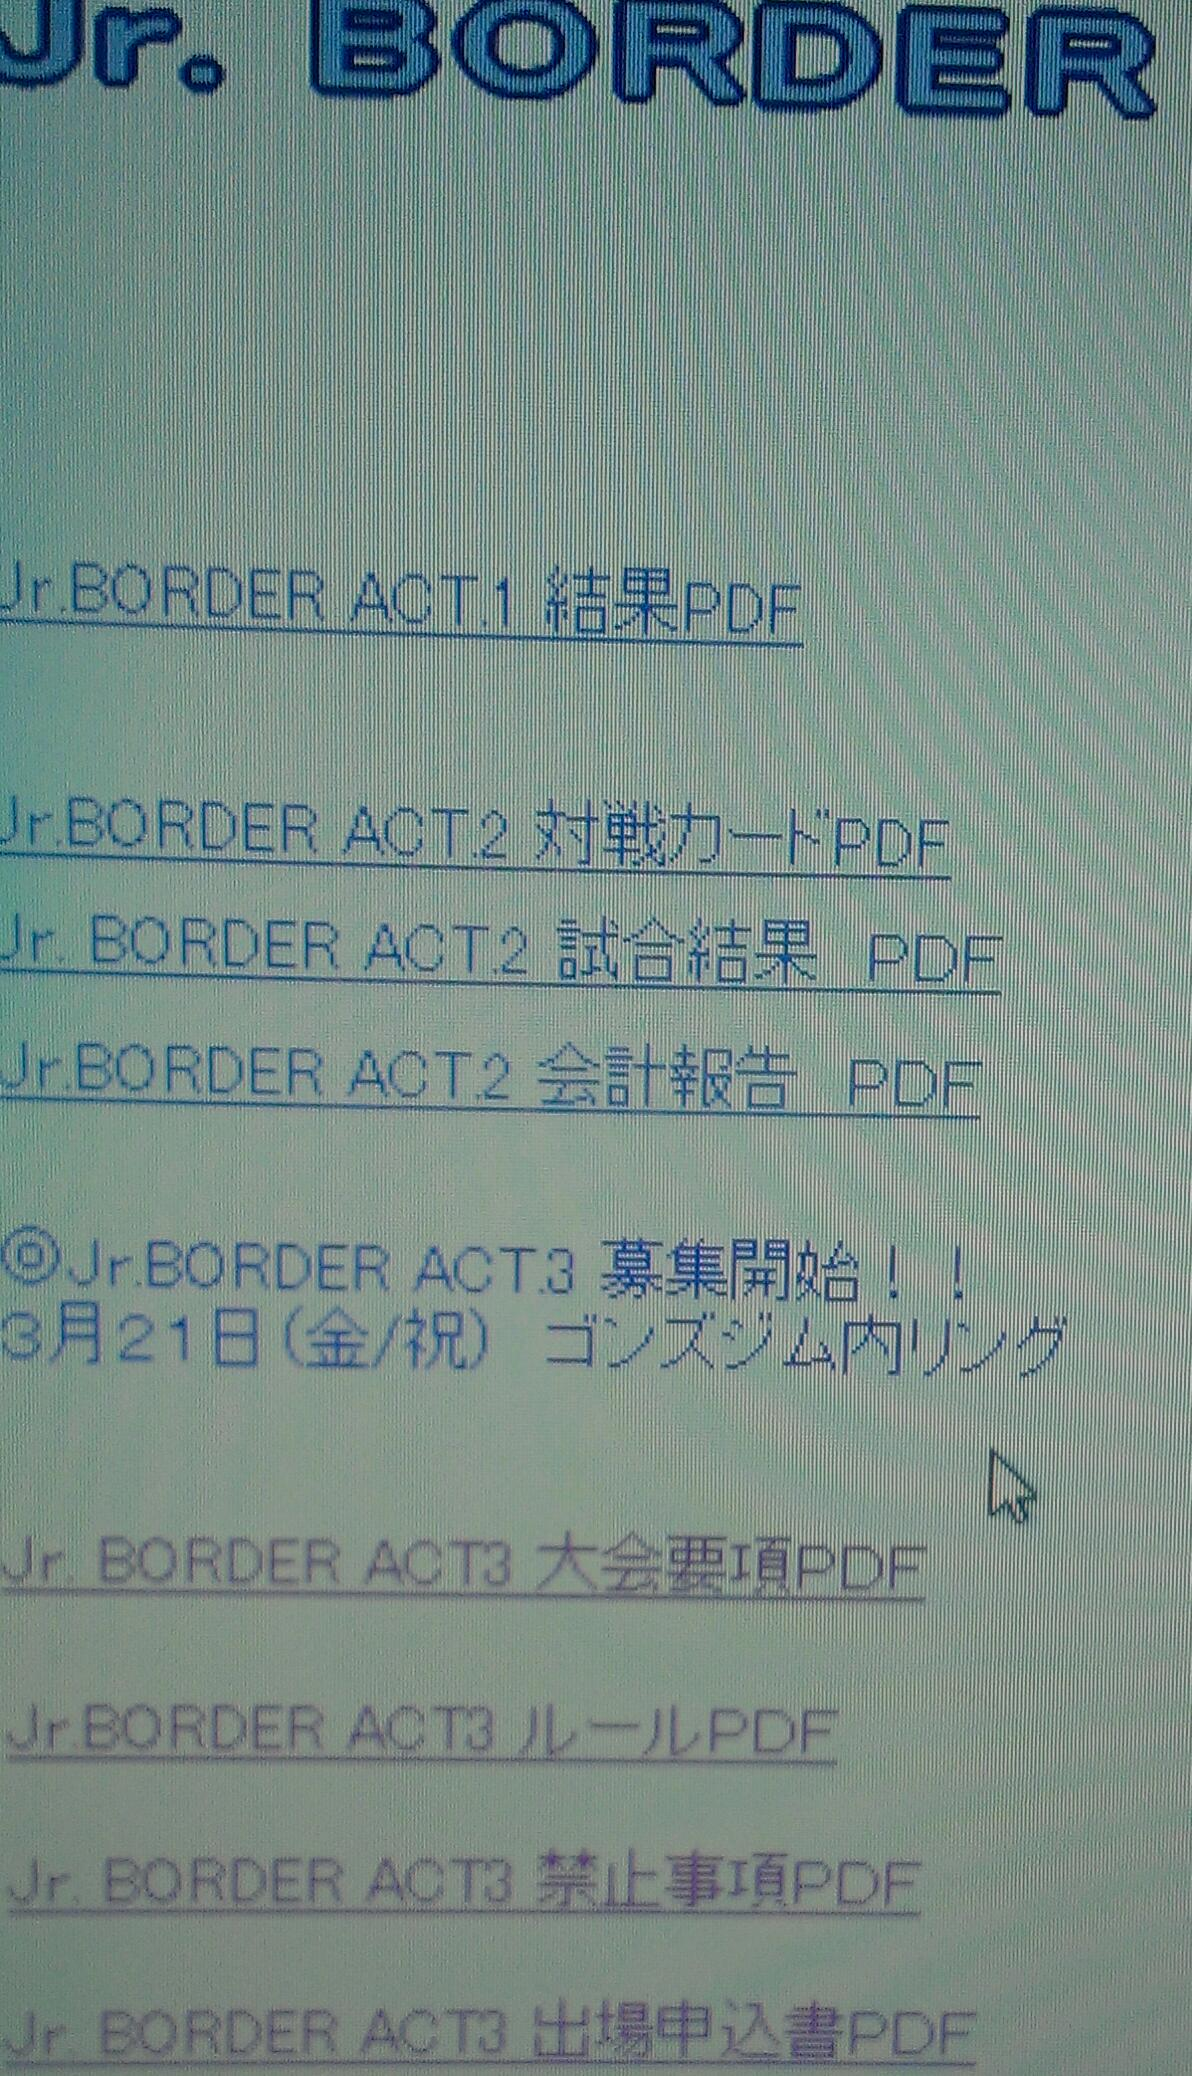 Jr. border 申込はじまりました!